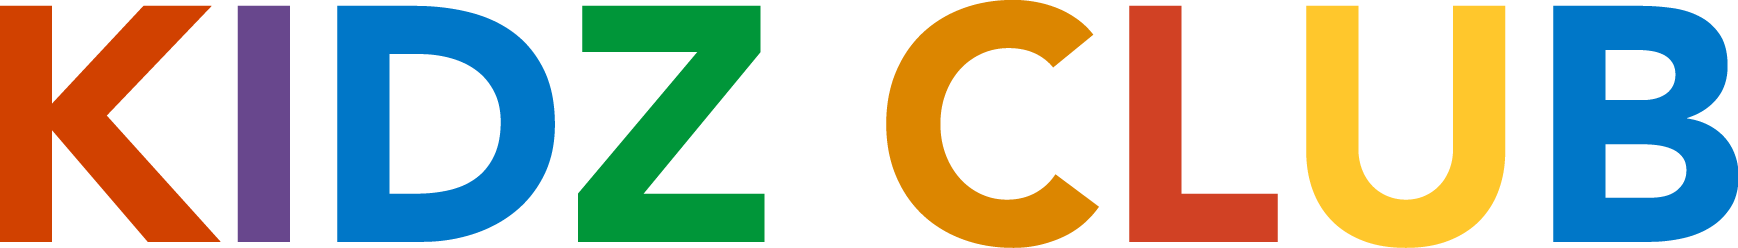 Click to download Kidz Club logo